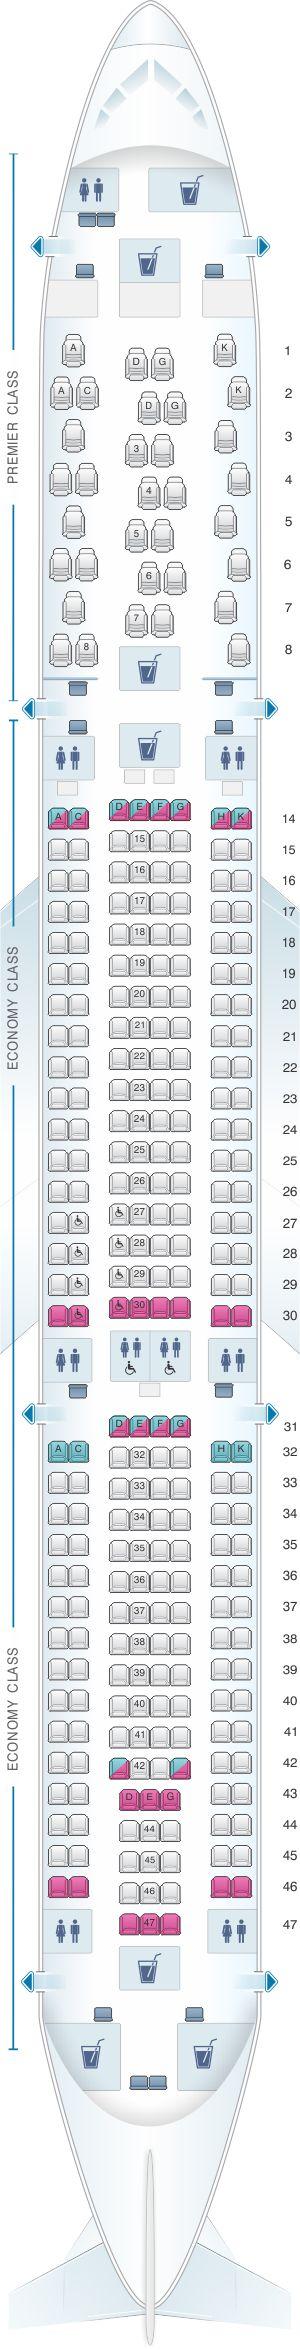 Seat Map Jet Airways Airbus A330 300 293PAX